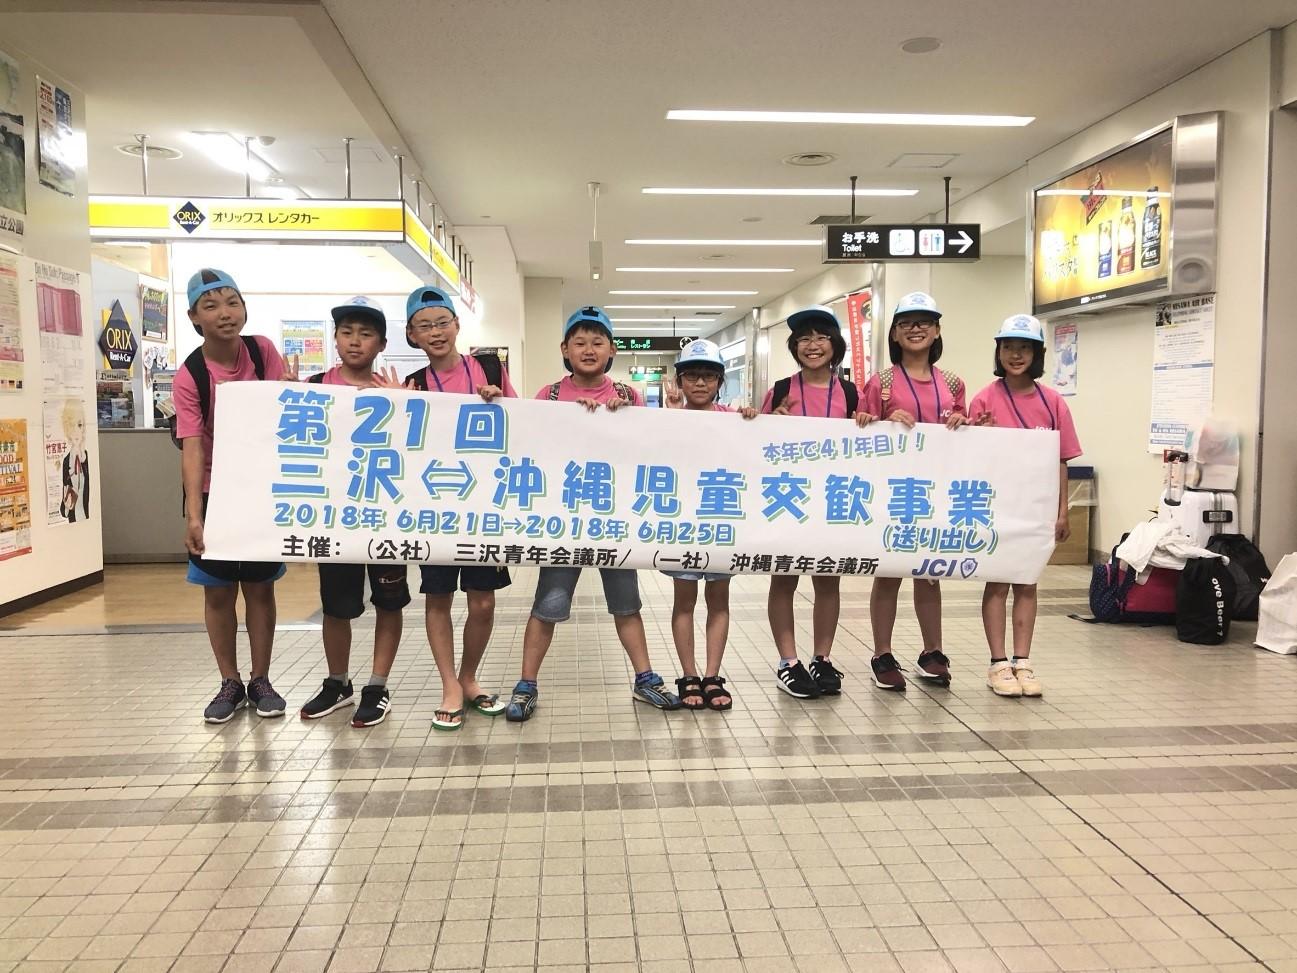 第21回三沢沖縄児童交歓事業(送り出し)5日目